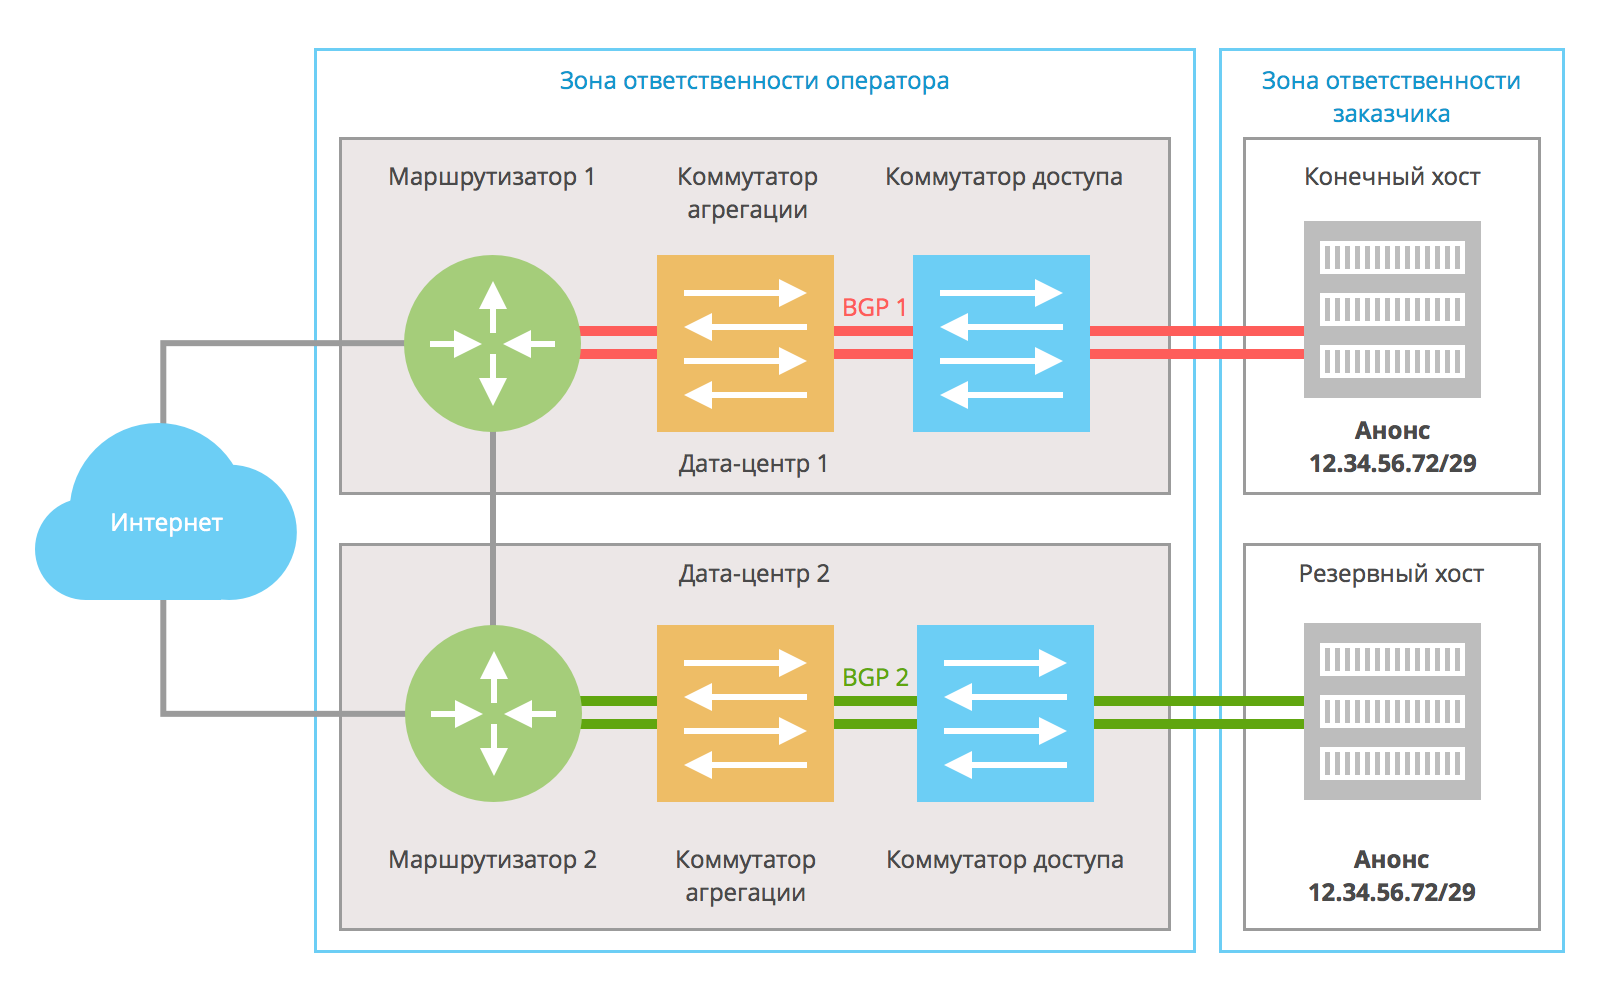 Сеть схема с маршрутизатором